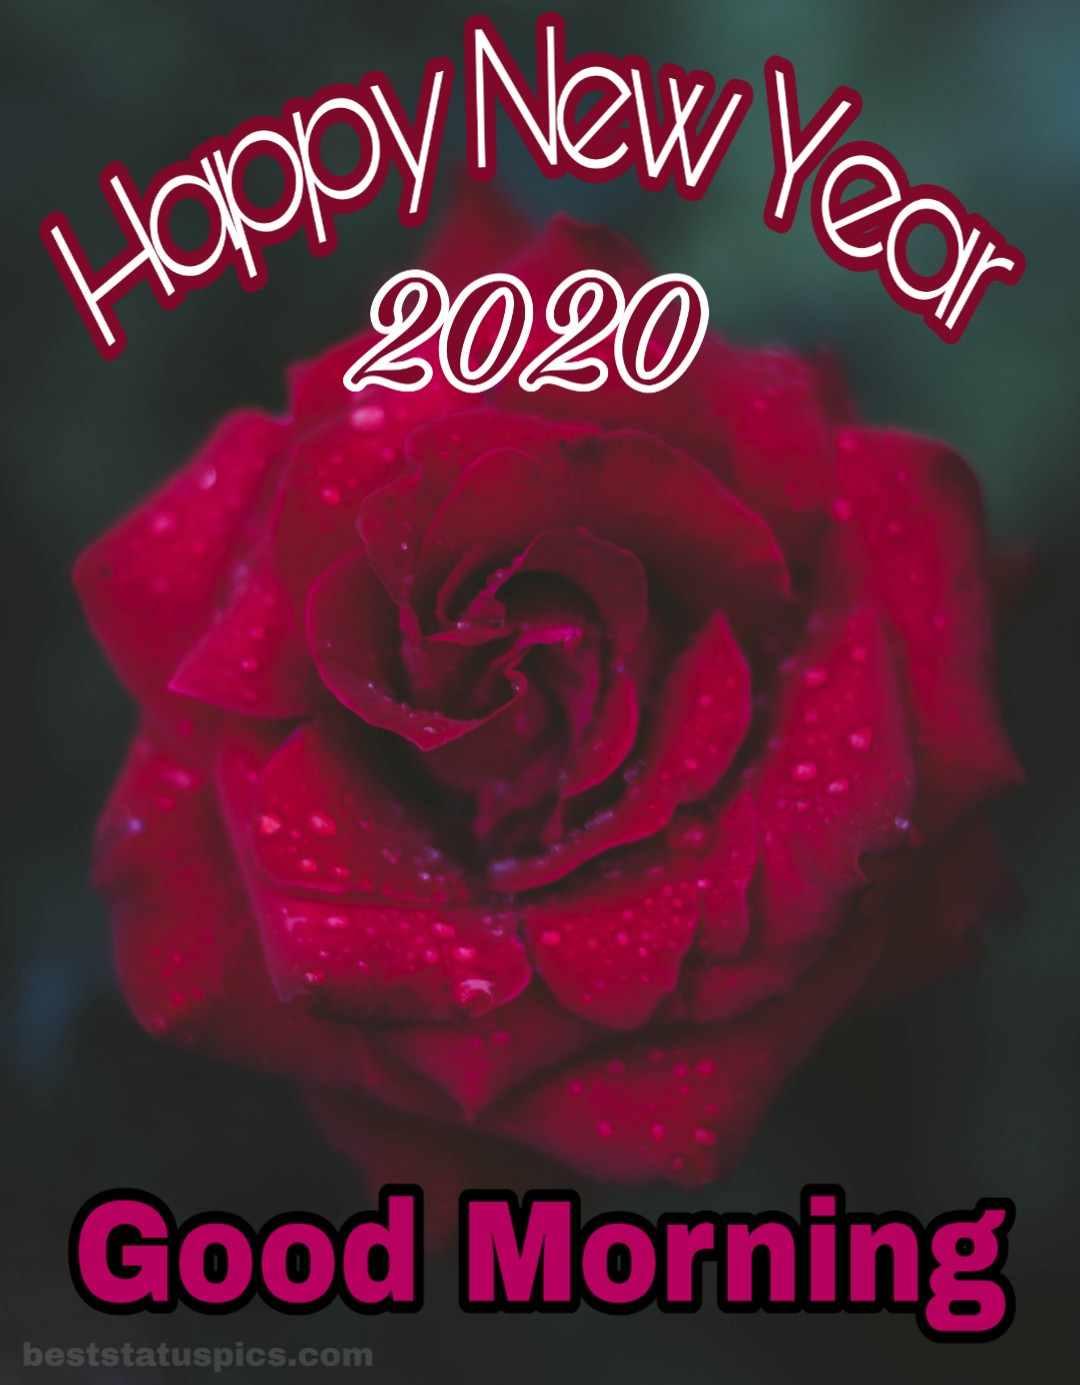 Good Morning Happy New Year 2020 Whatsapp Dp Status Images